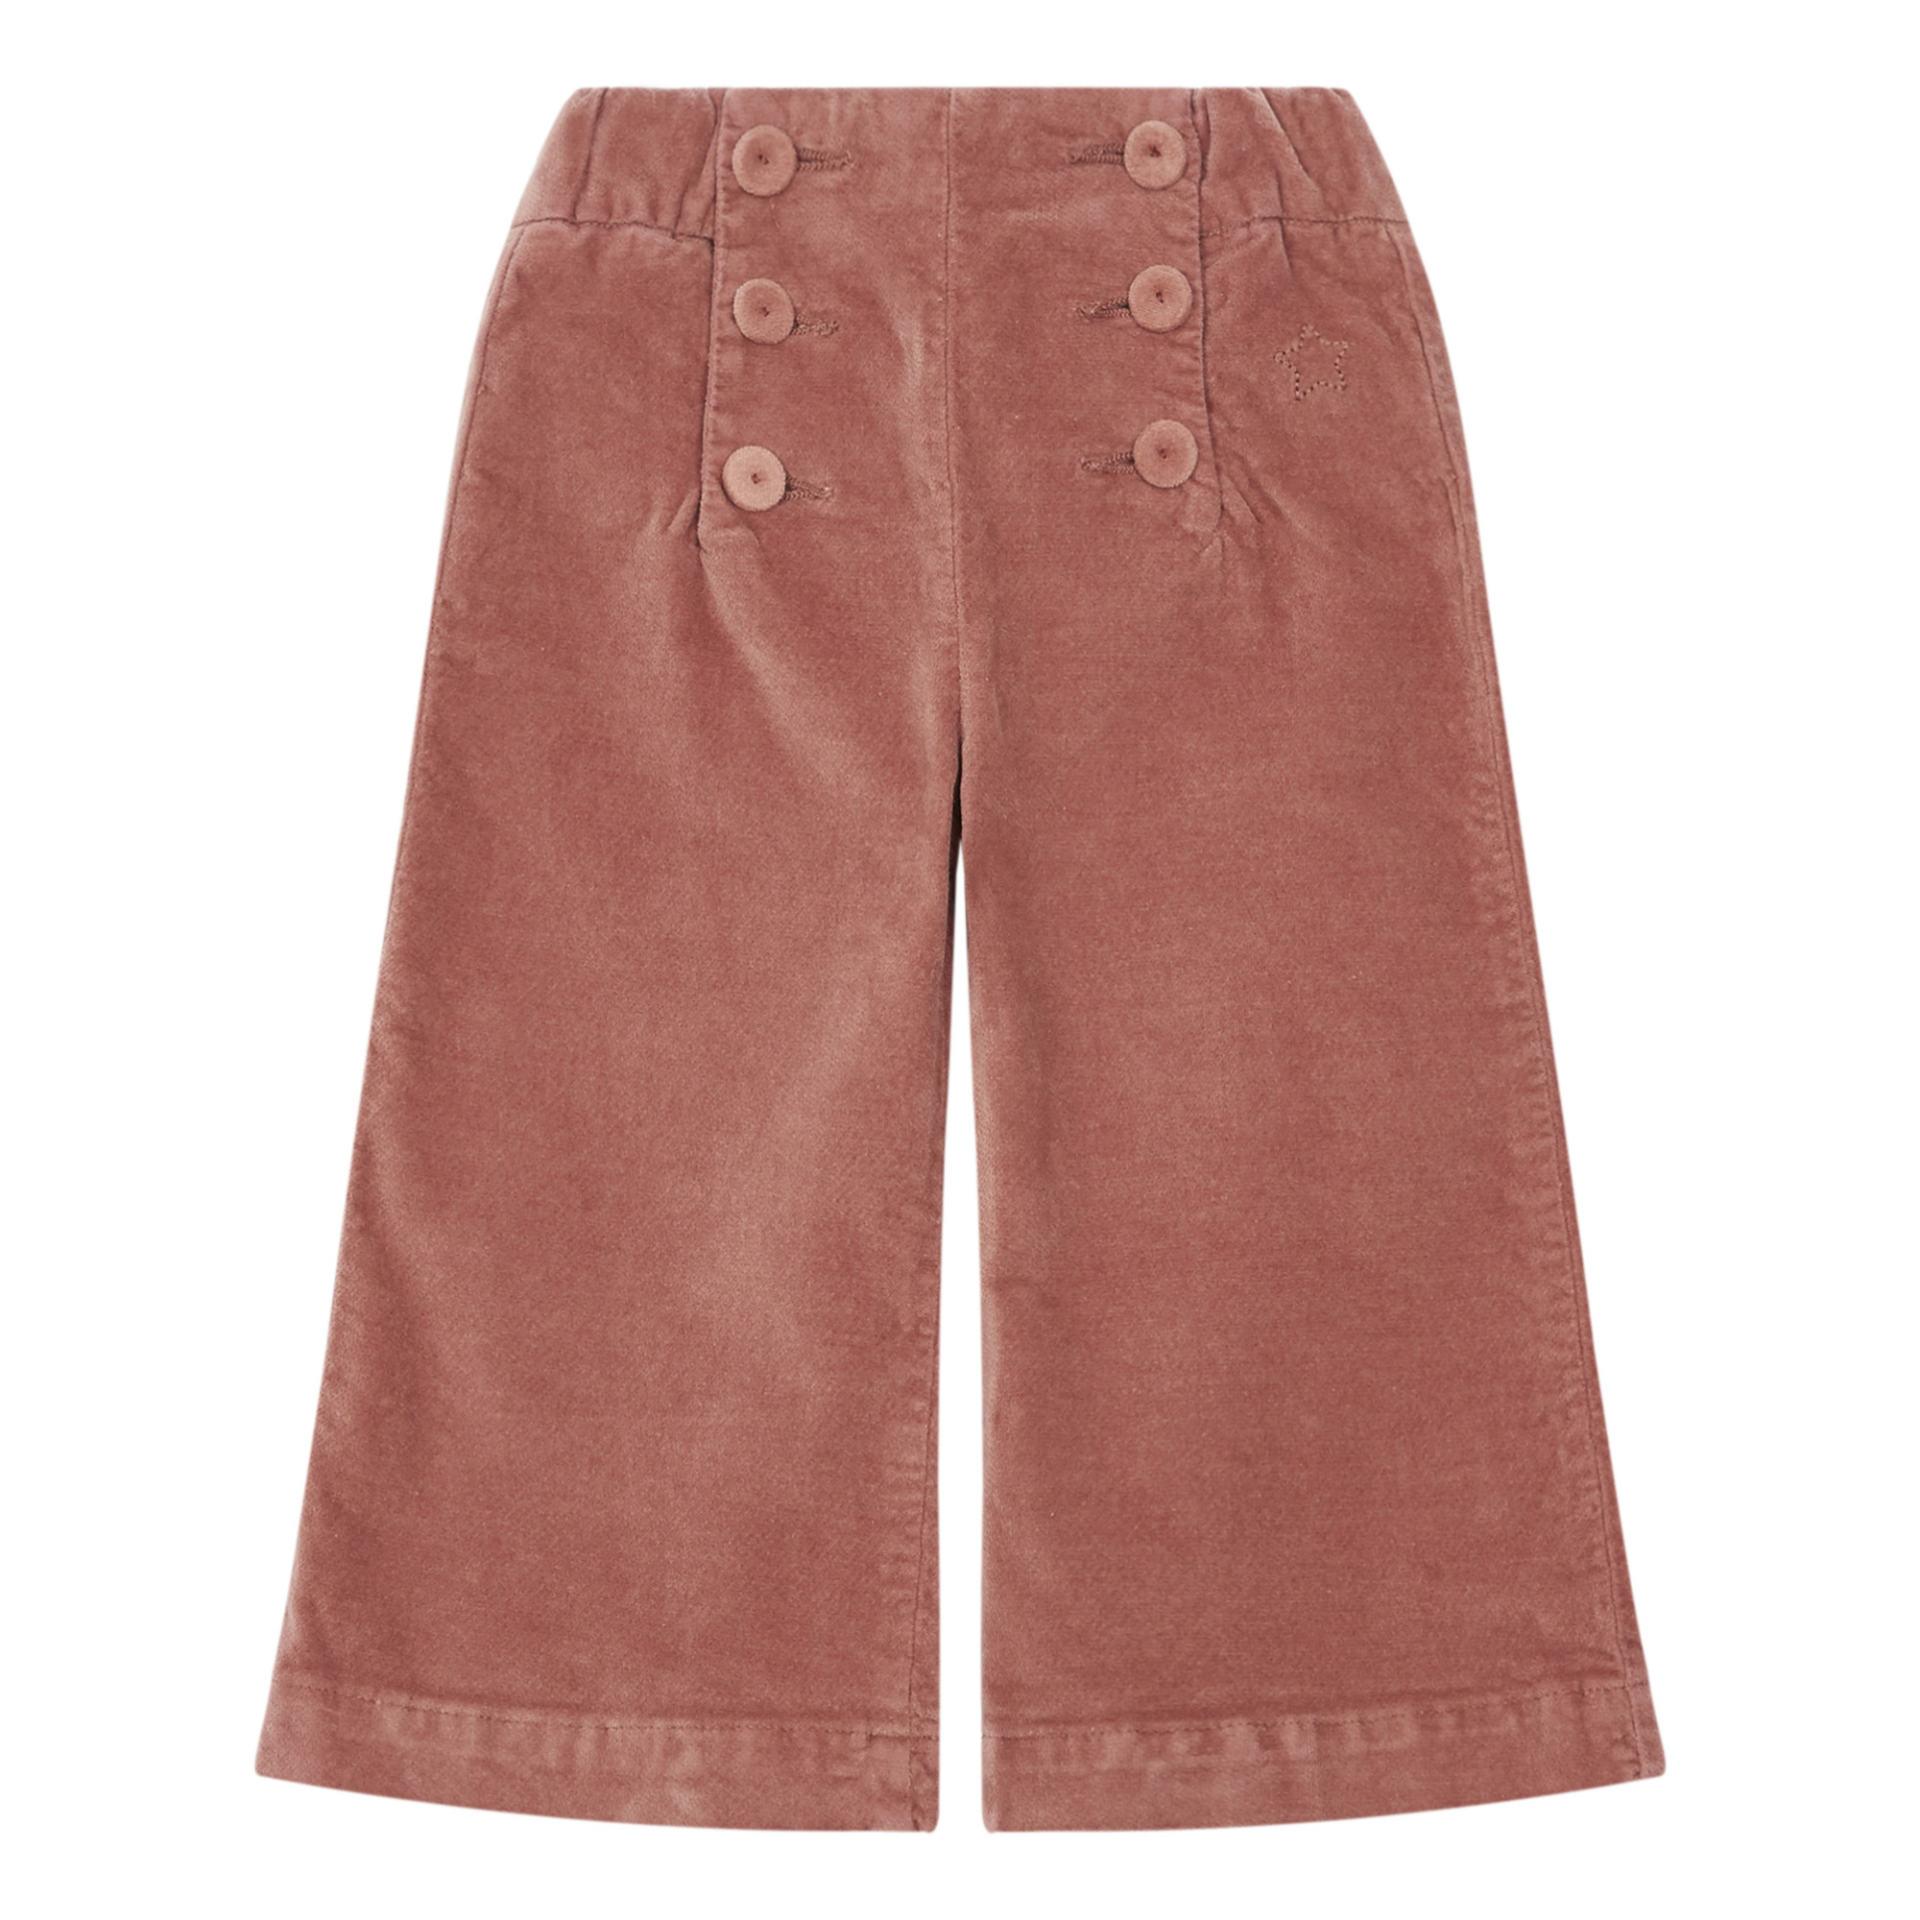 pantalon-flare-velours-tocoto-vintage